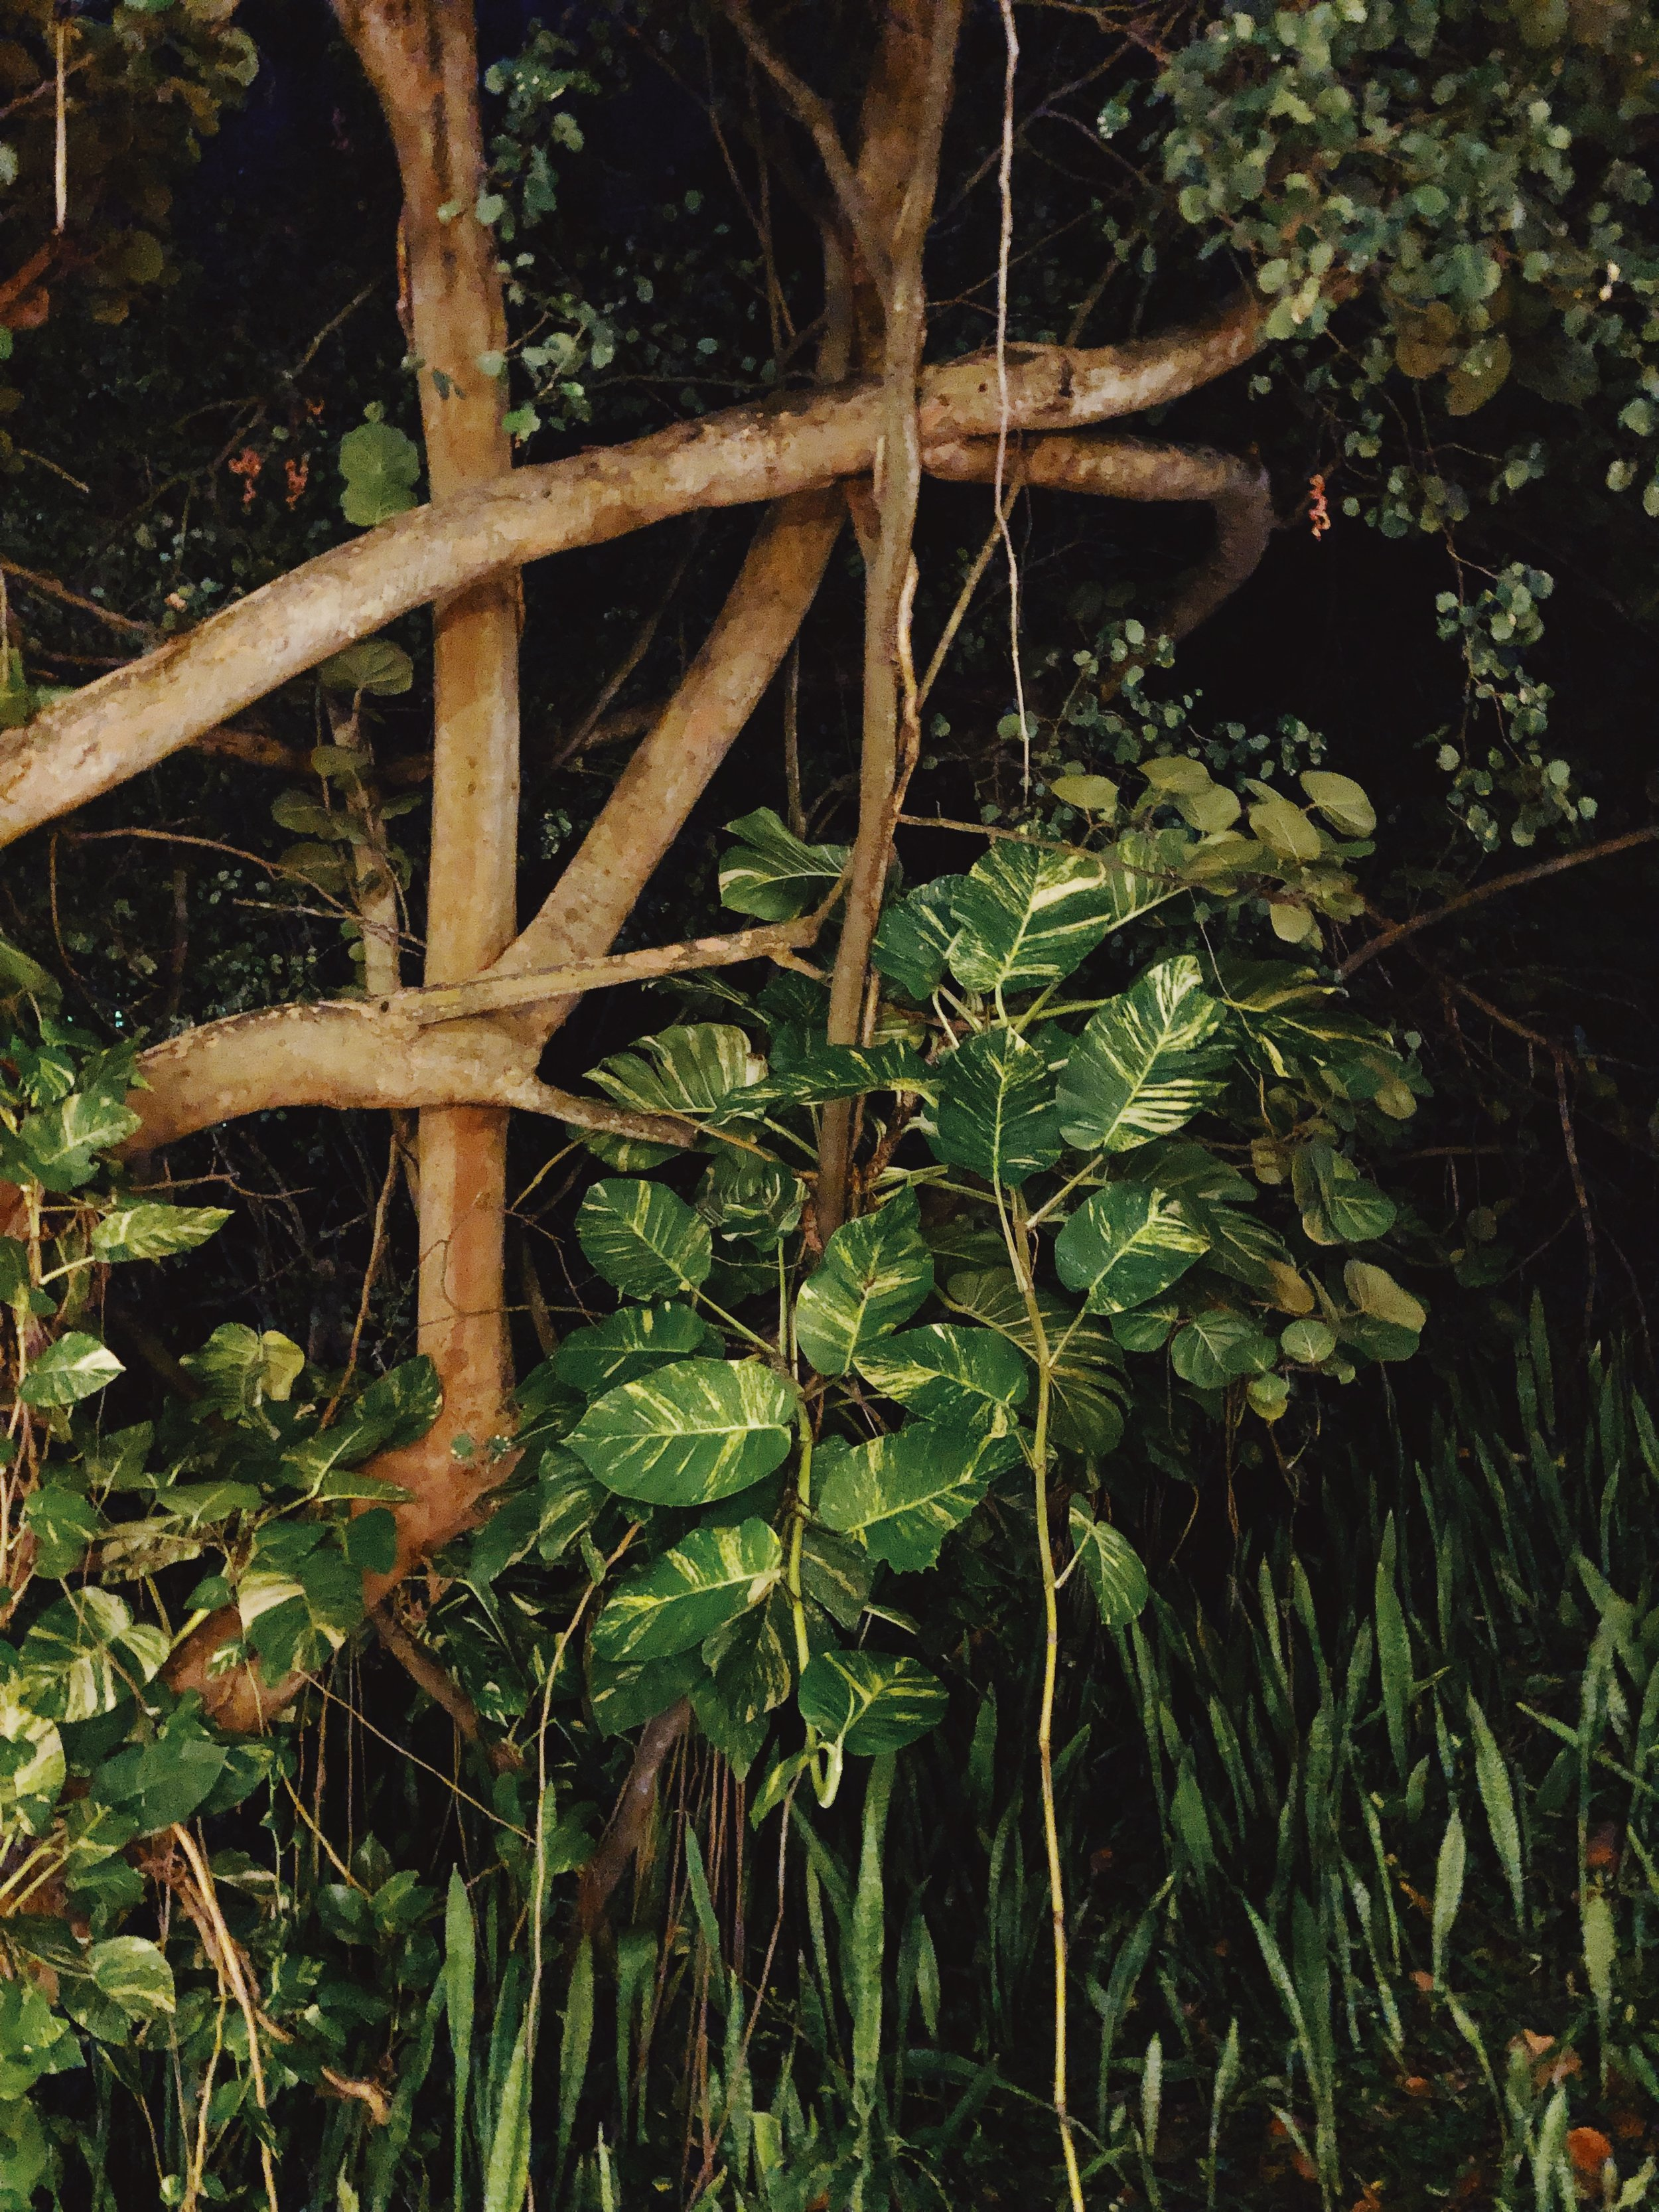 nature_denuit_creolebeach_©virginielentulus.JPG